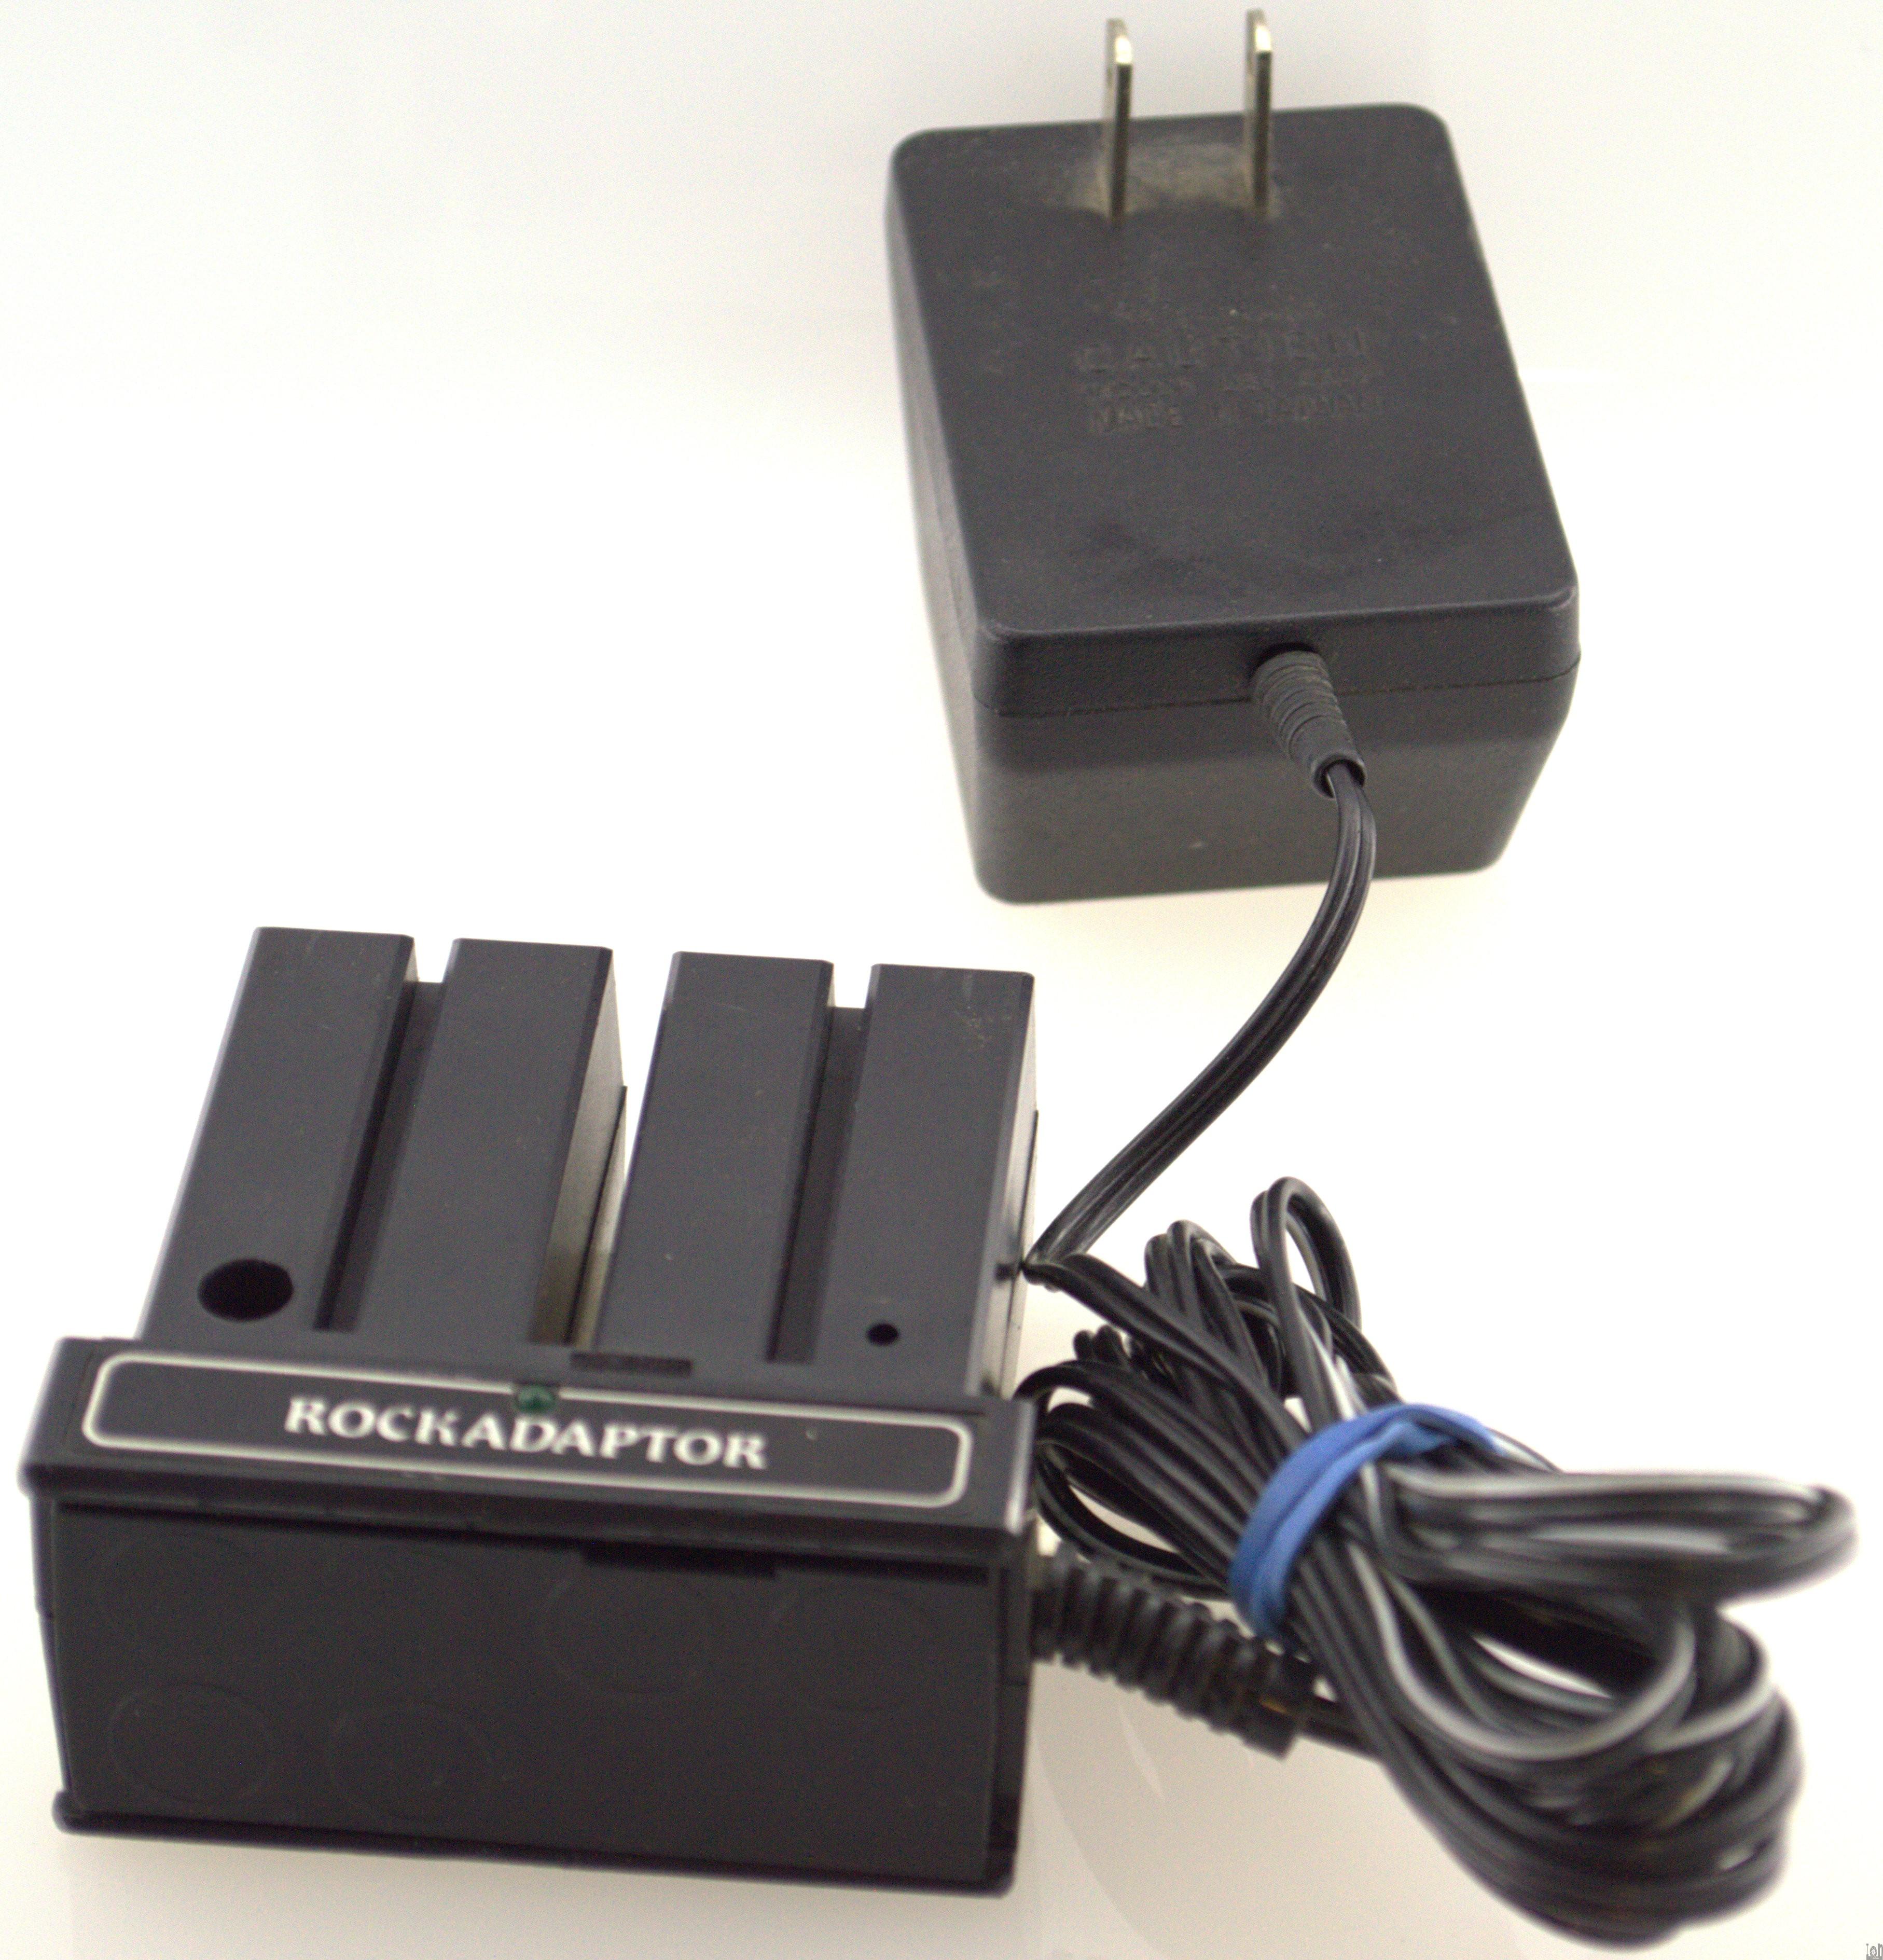 scholz rockadapter sr d power supply for rockman x100 soloist. Black Bedroom Furniture Sets. Home Design Ideas